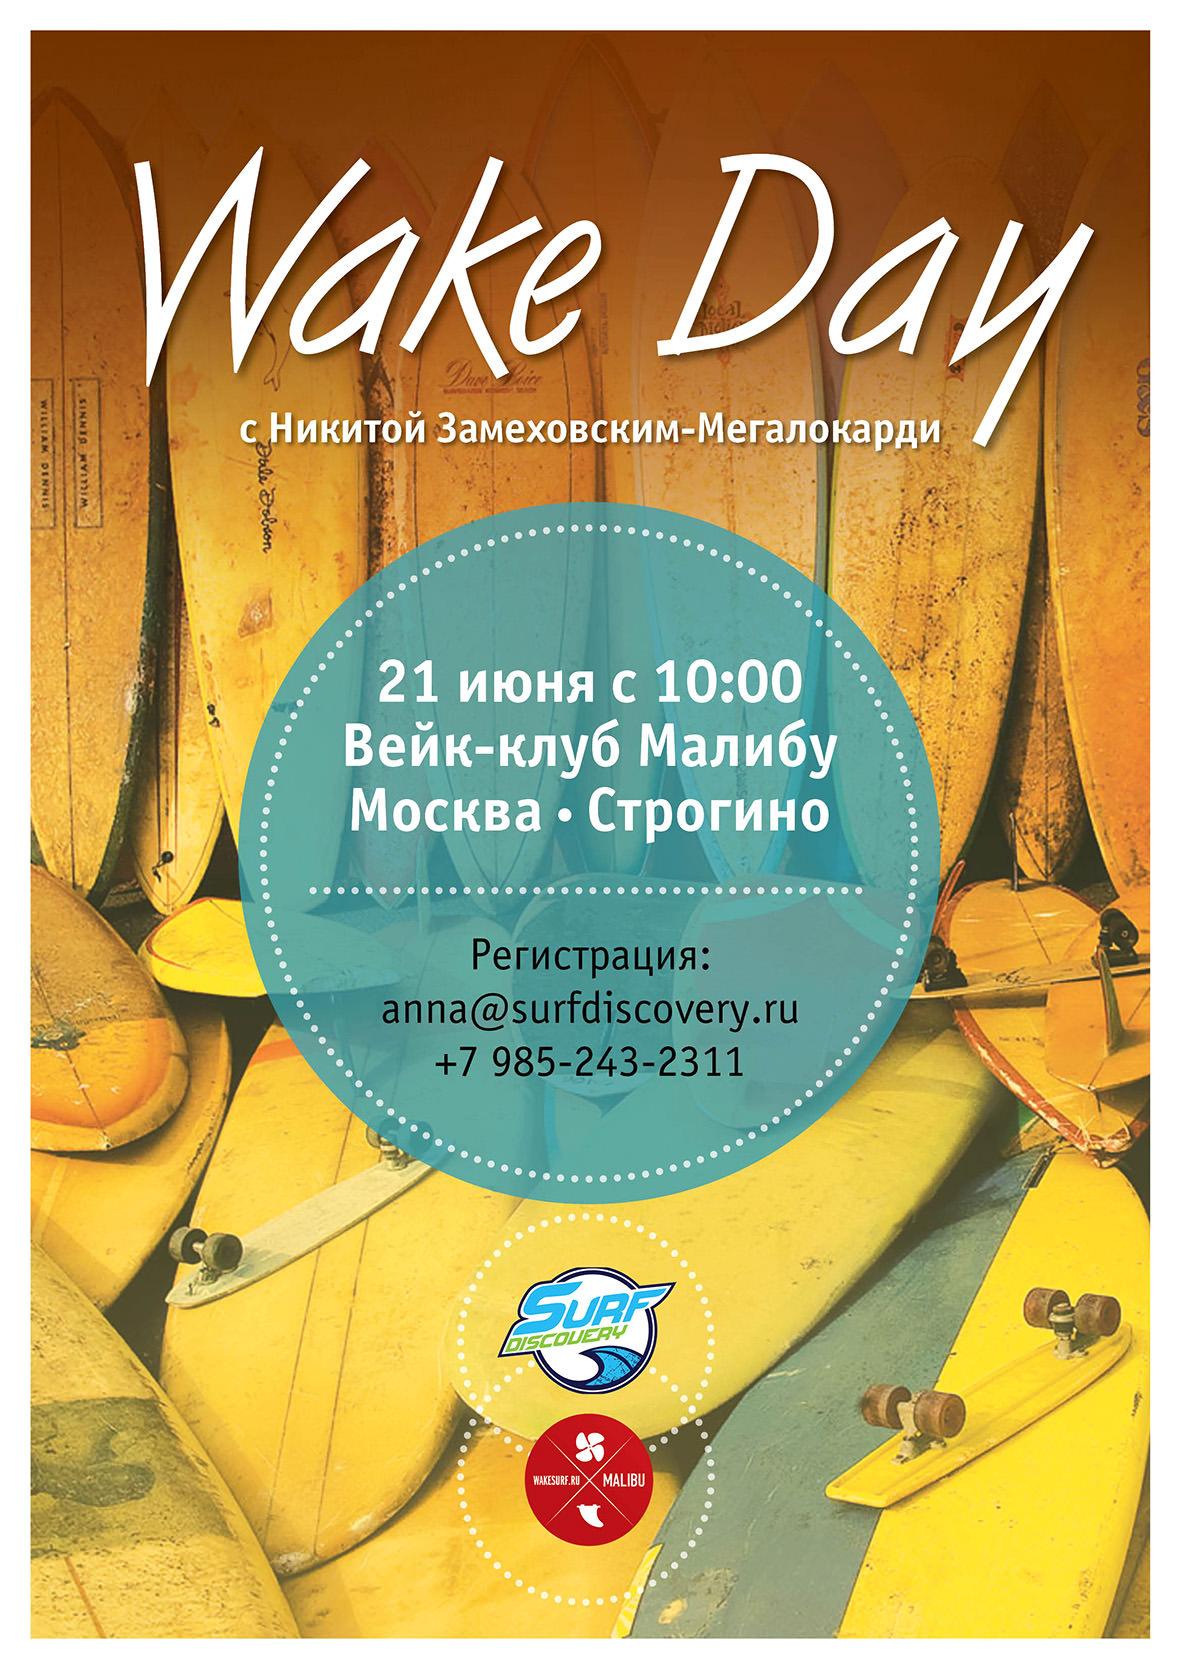 Wake Day с Никитой Замеховским-Мегалокарди!